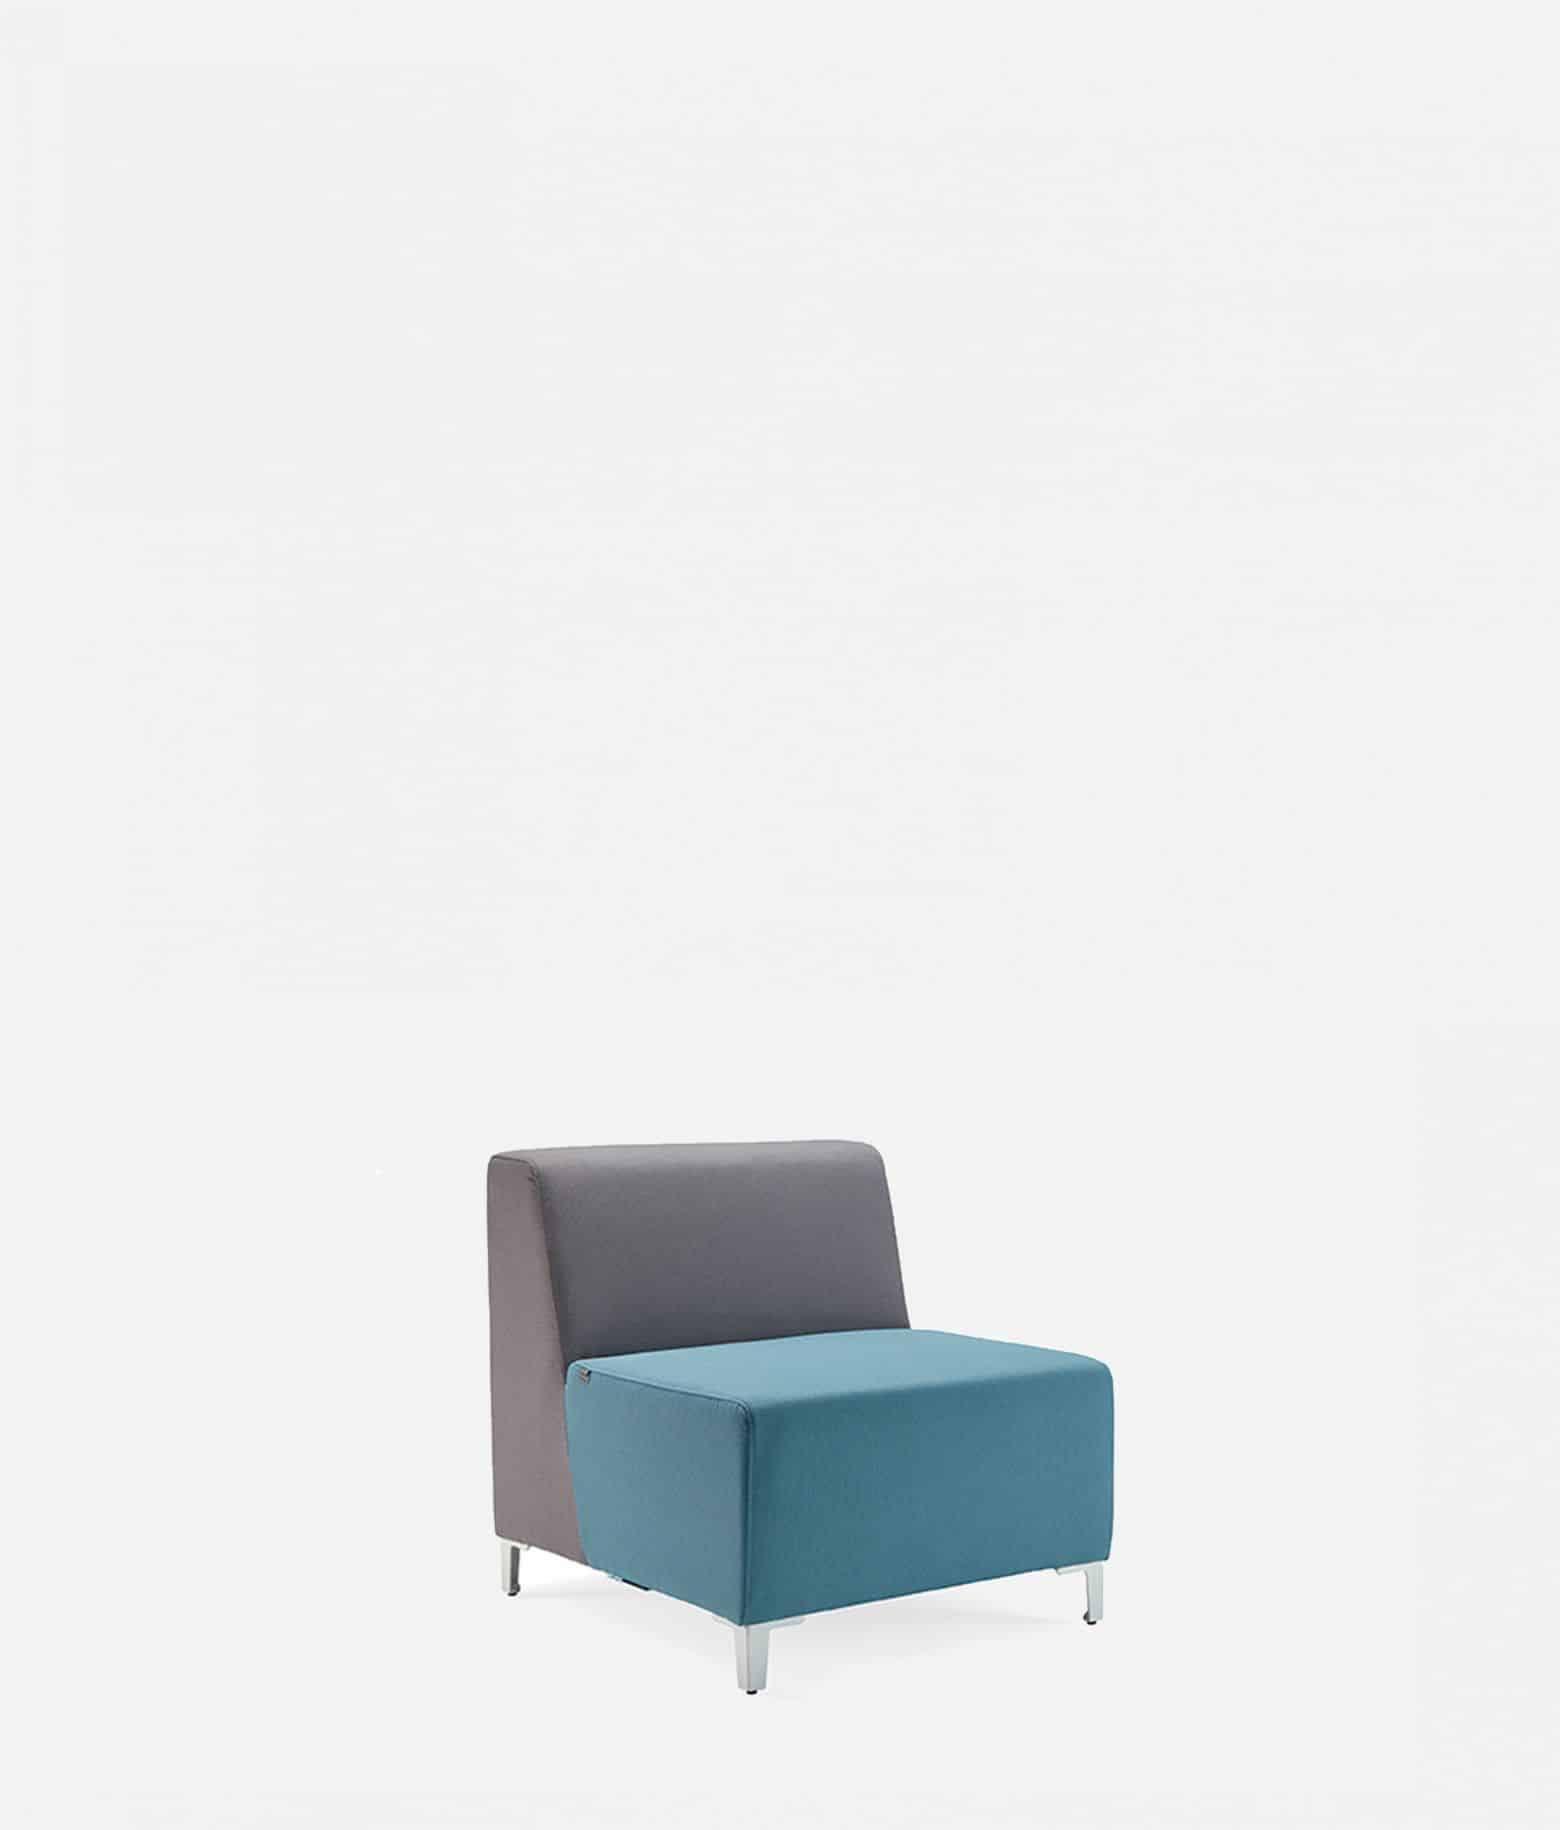 Simple Lounge Seating m